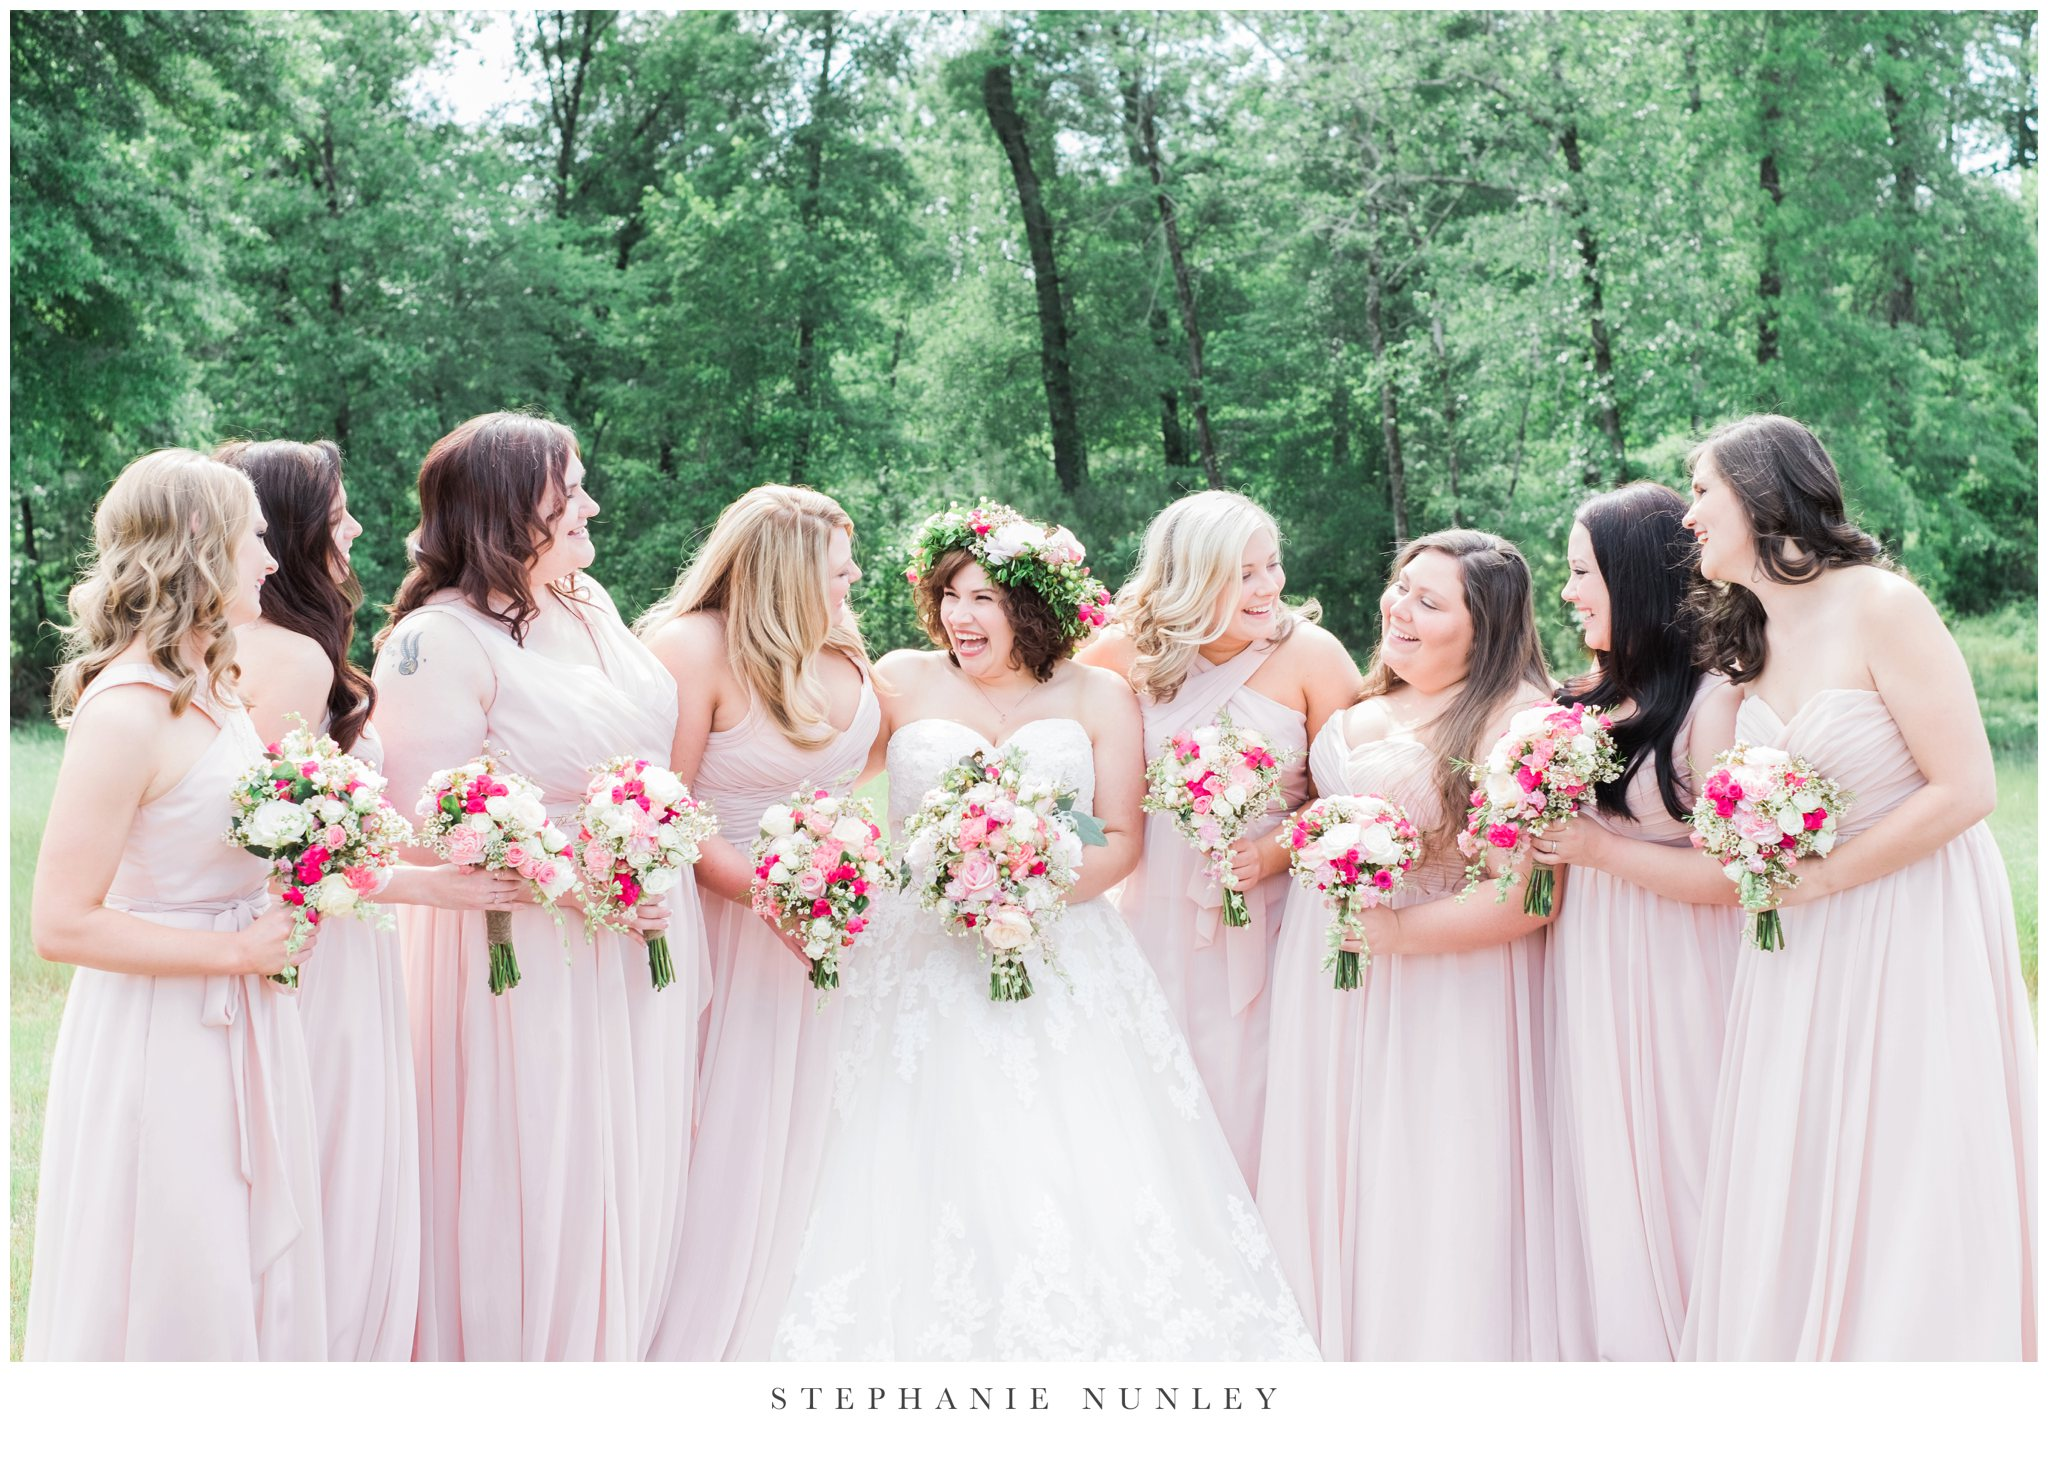 romantic-outdoor-wedding-with-flower-crown-0079.jpg